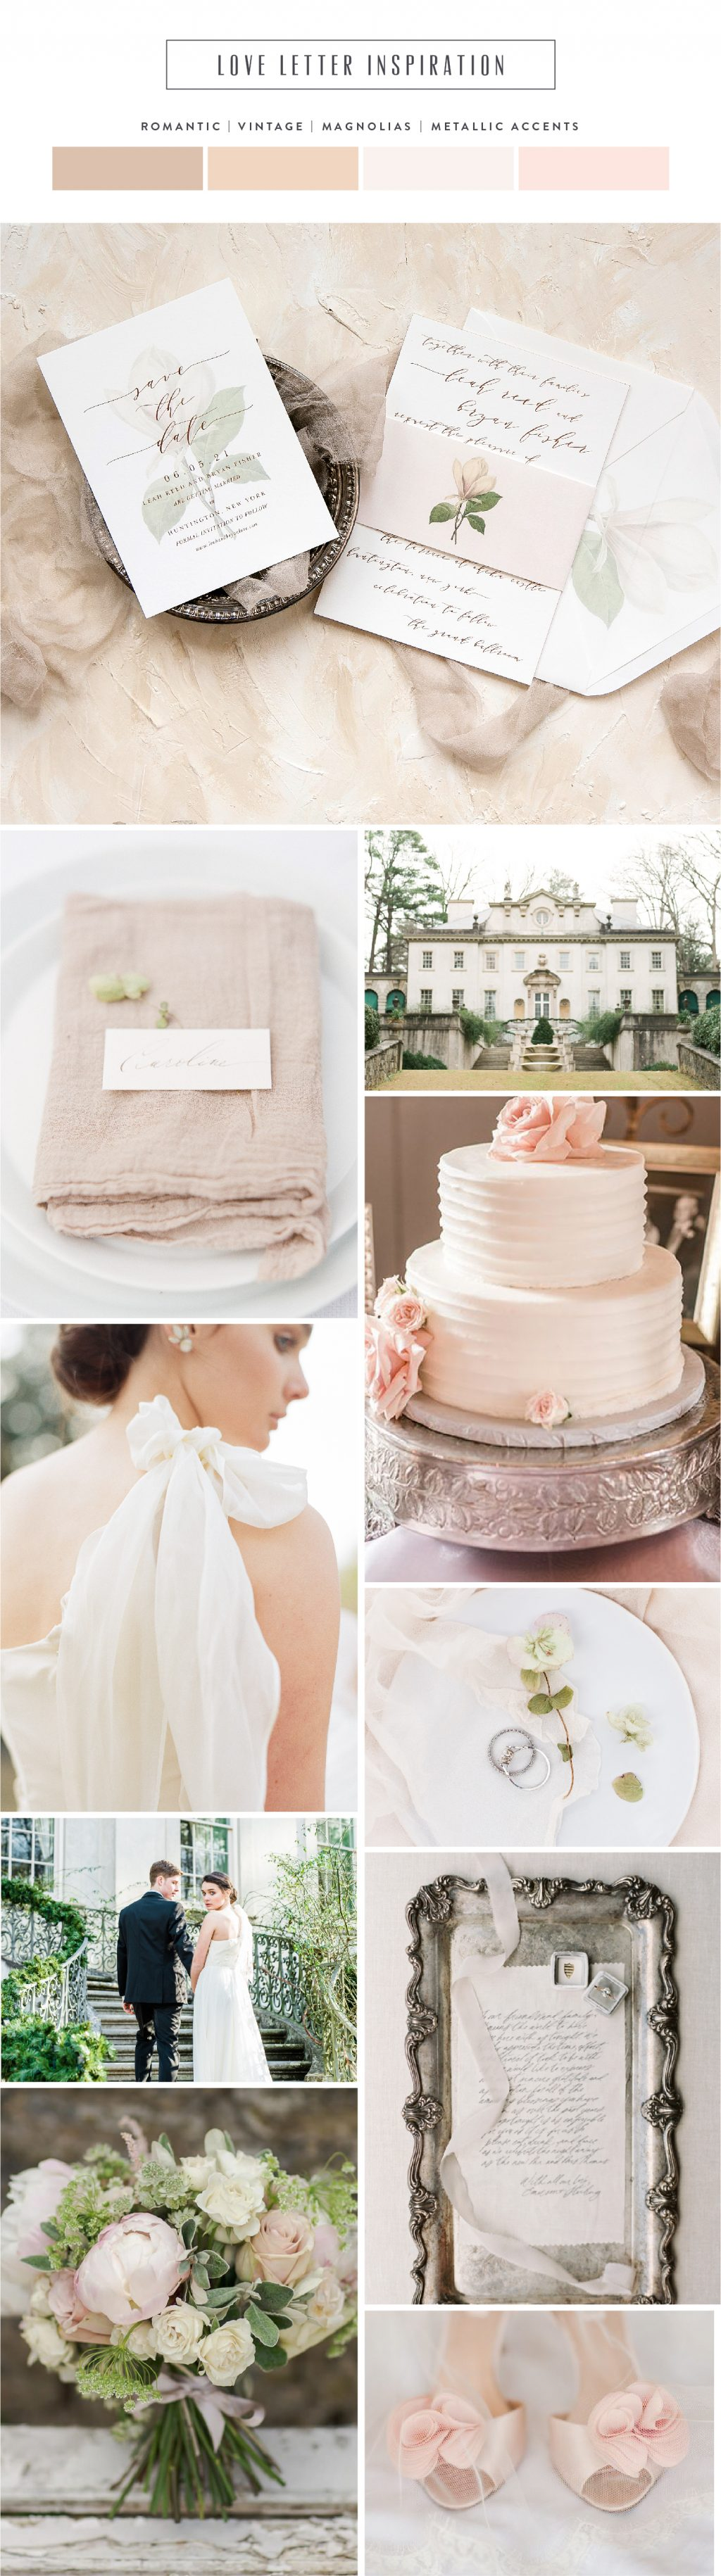 Introducing Love Letter: romantic floral wedding invitation inspiration | Bella Figura